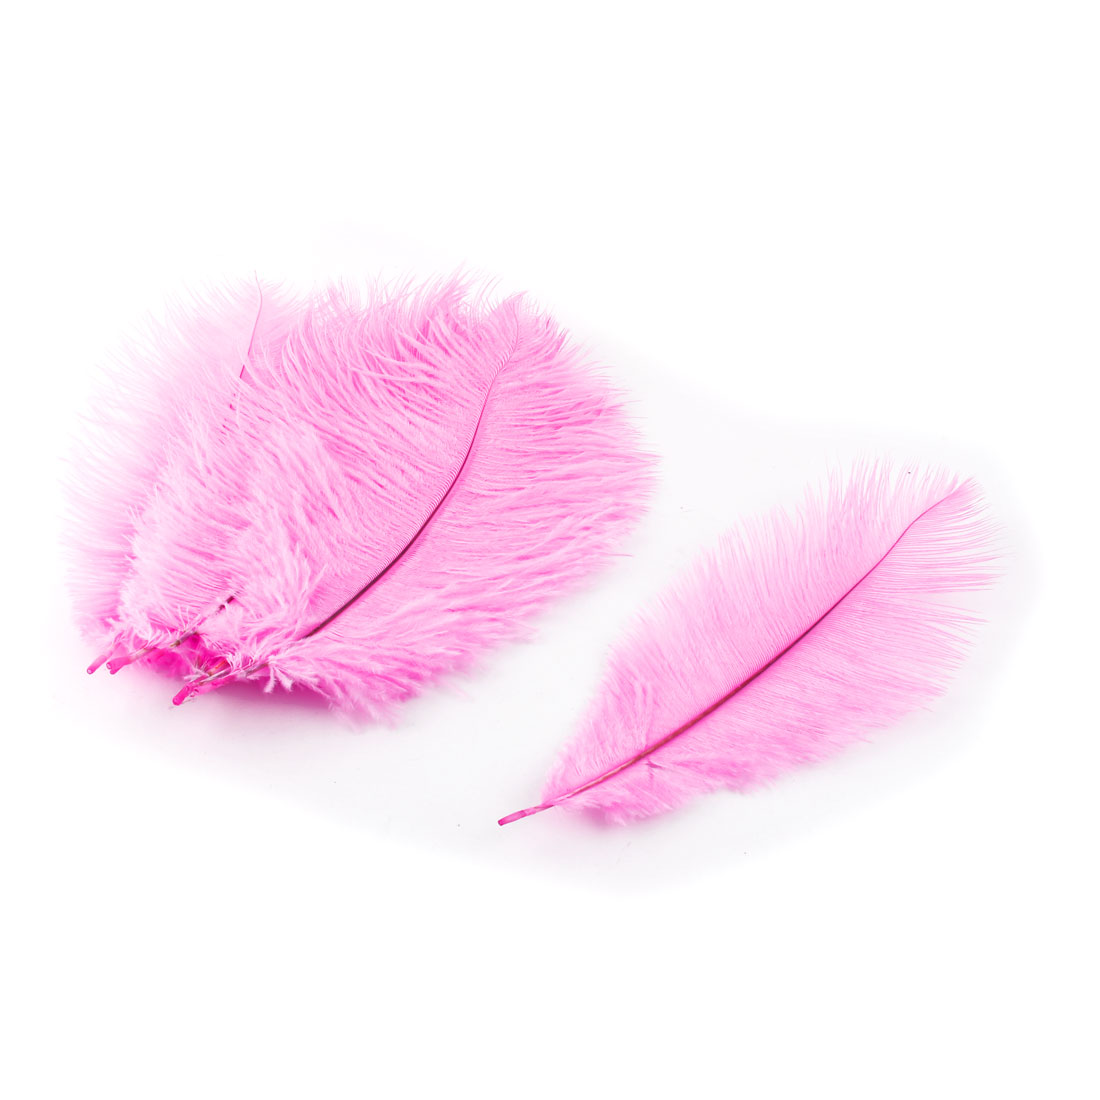 Wedding Party Clothes DIY Decor Ostrich Feathers Plume Pink 20-25cm Length 10pcs